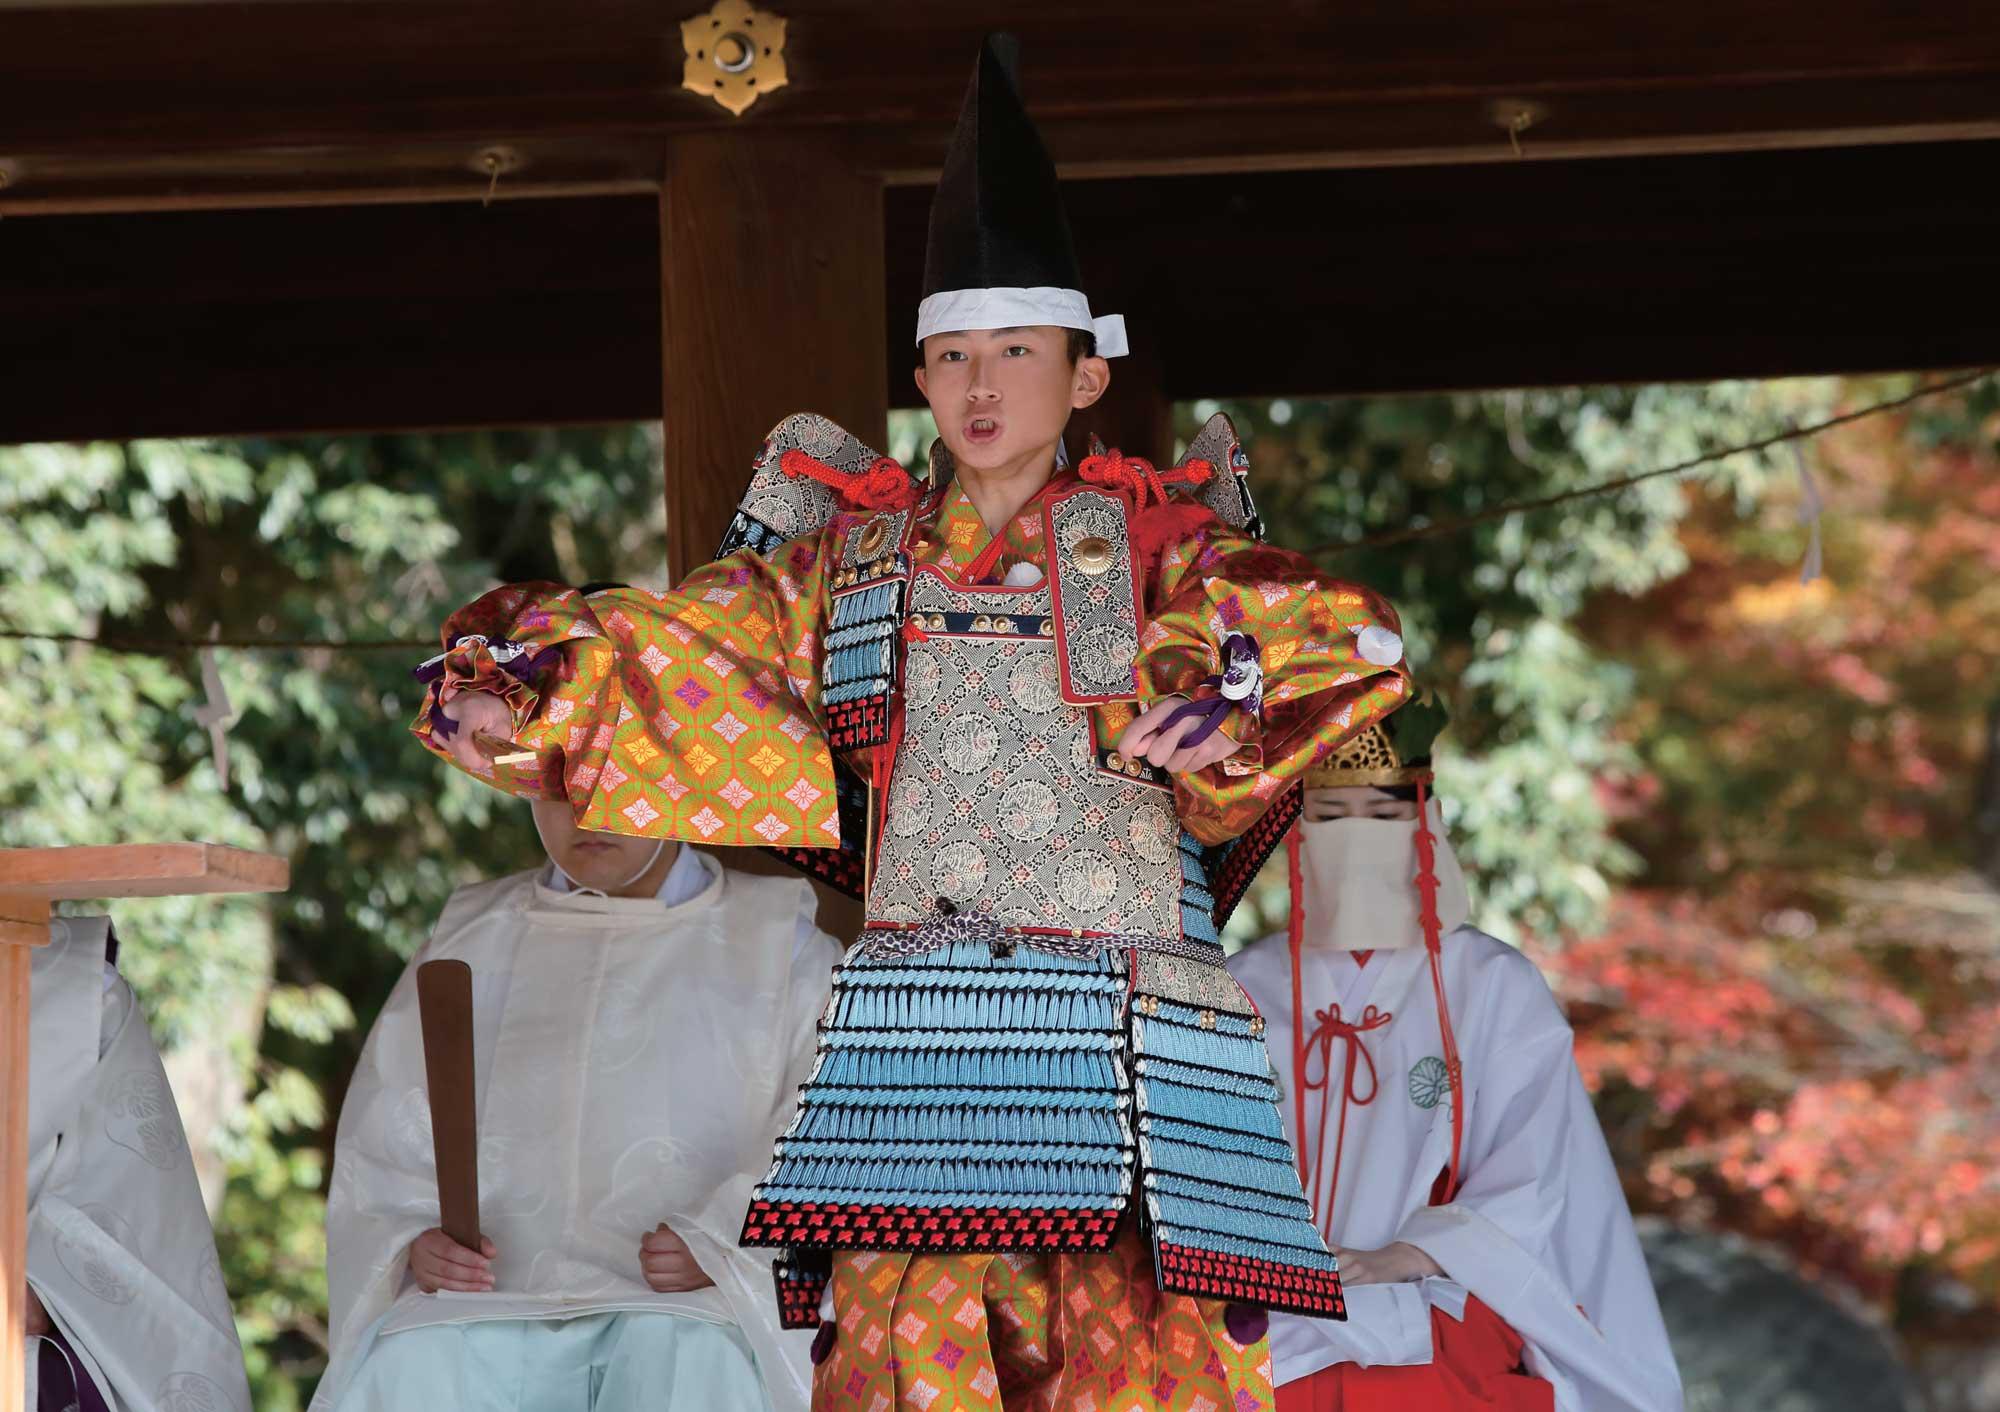 Performance at Kamigamo shrine